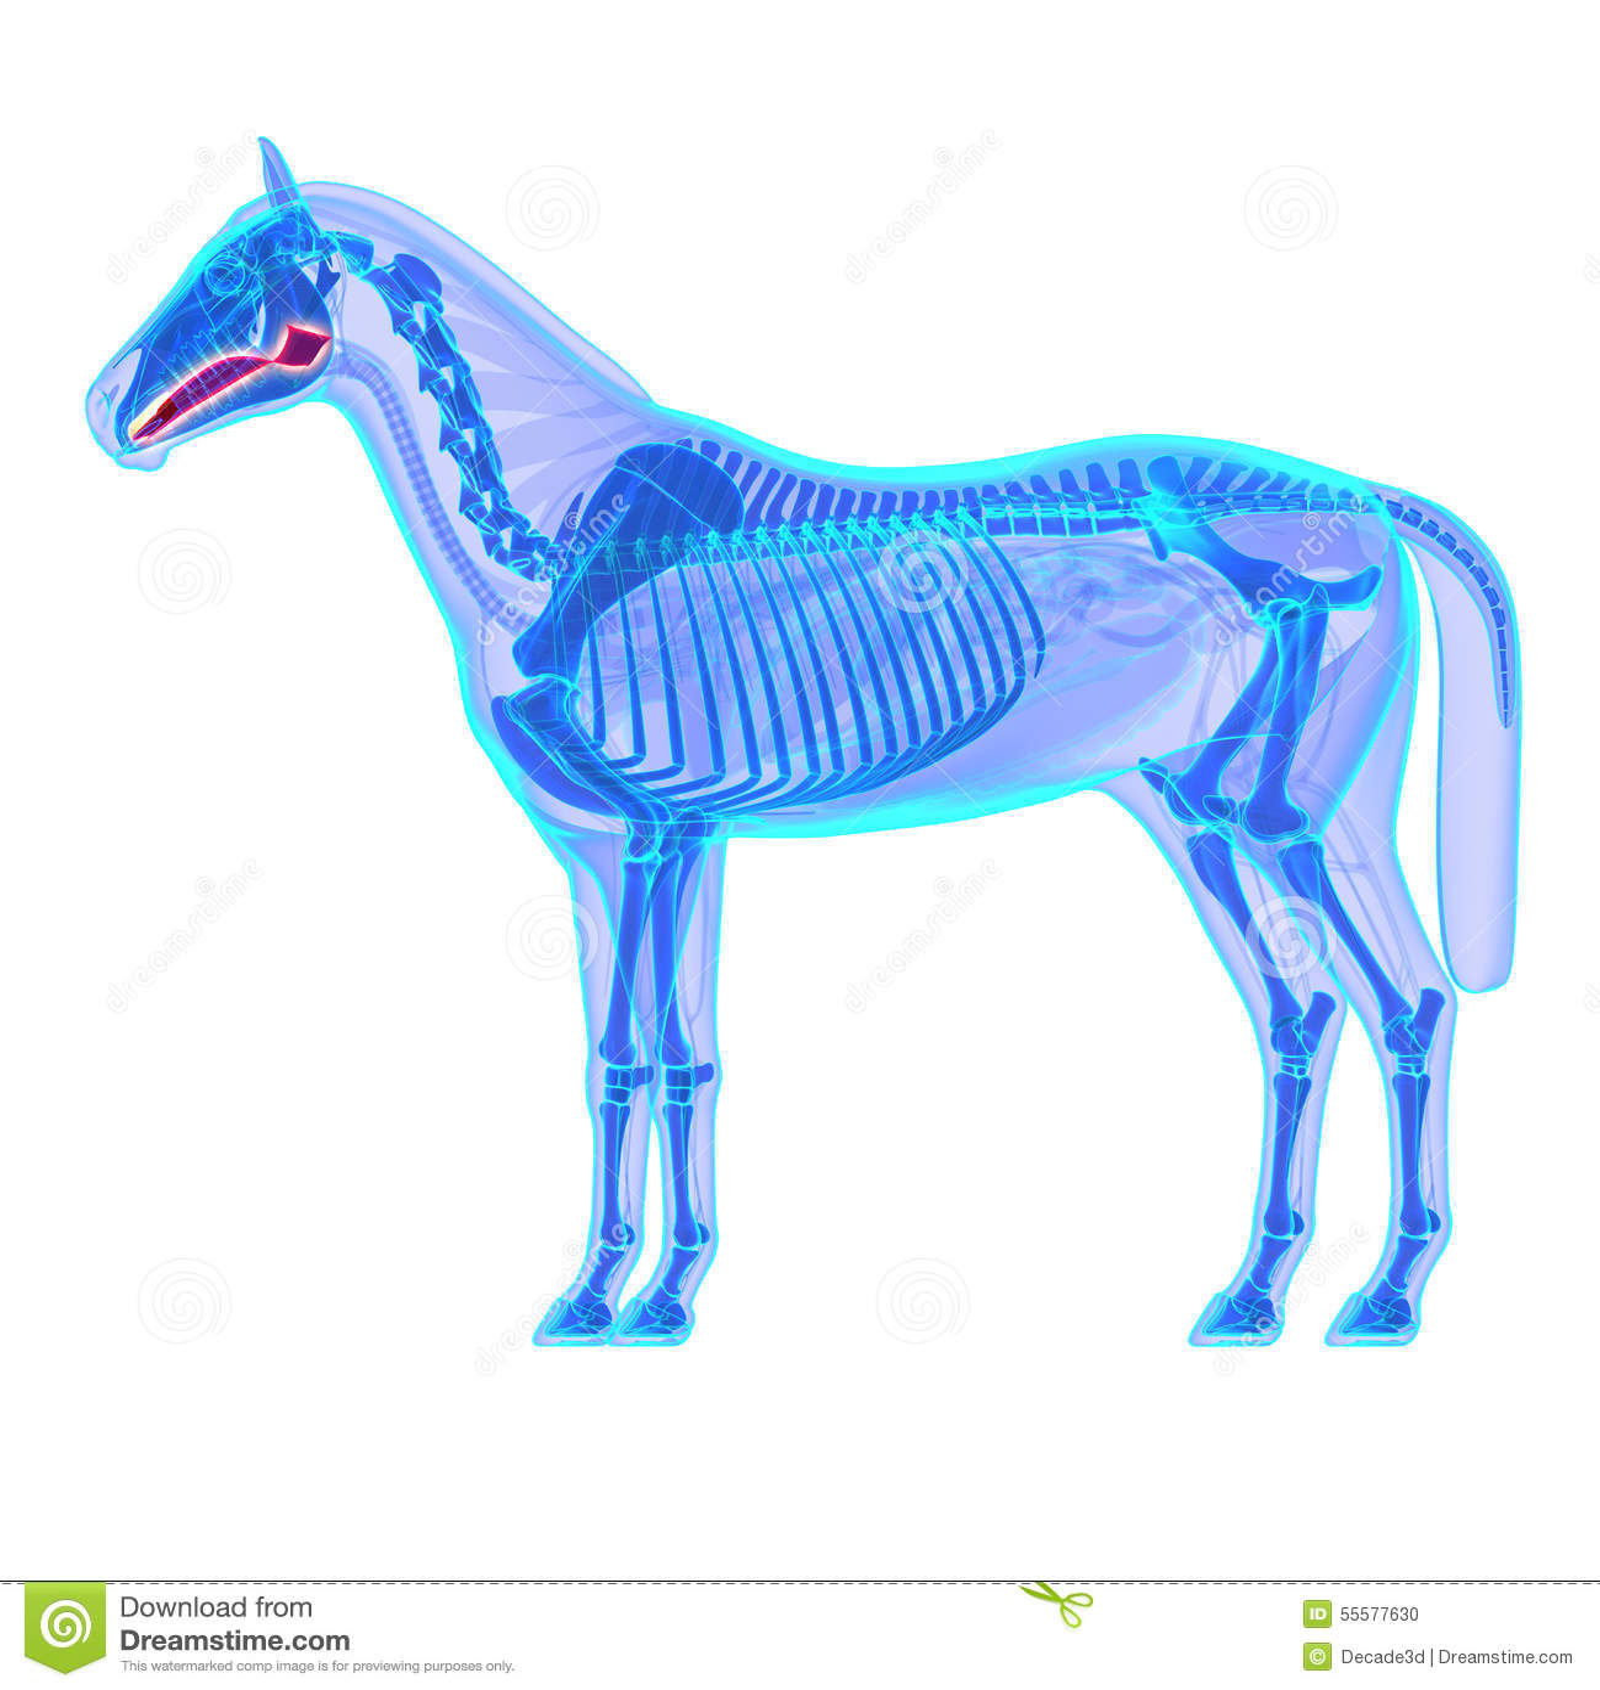 Lengua Del Caballo - Anatomía Del Equus Del Caballo - Aislada En ...